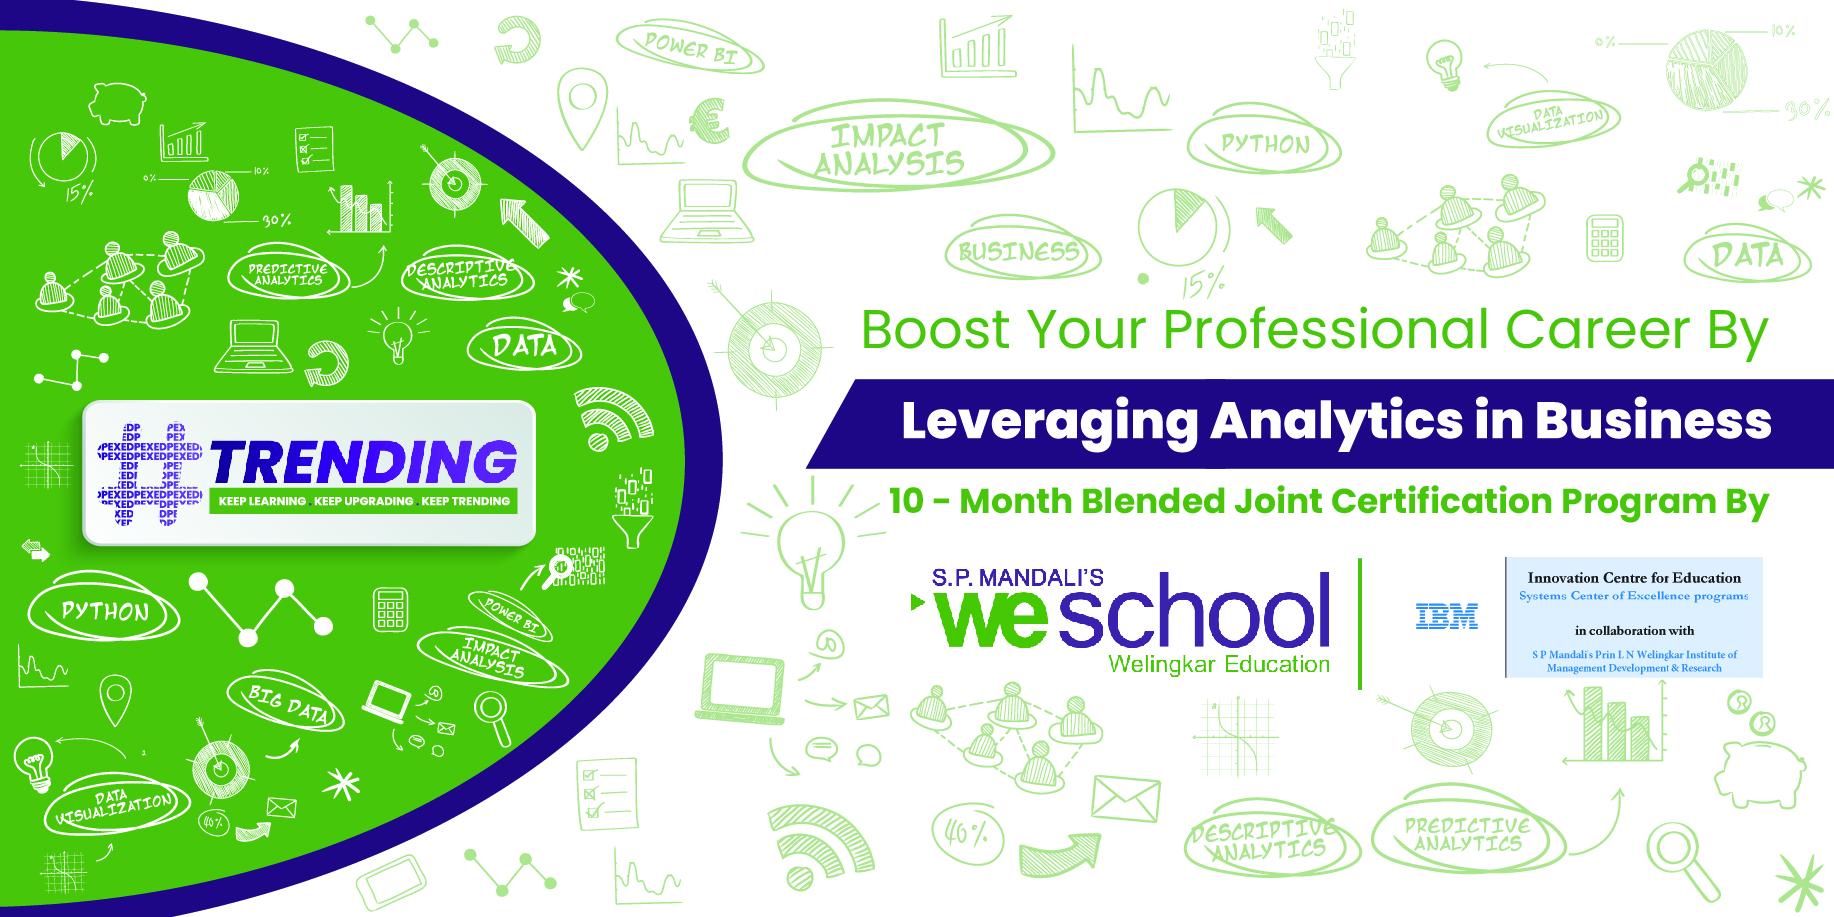 Leveraging Analytics In Business <br>( 10 Months )